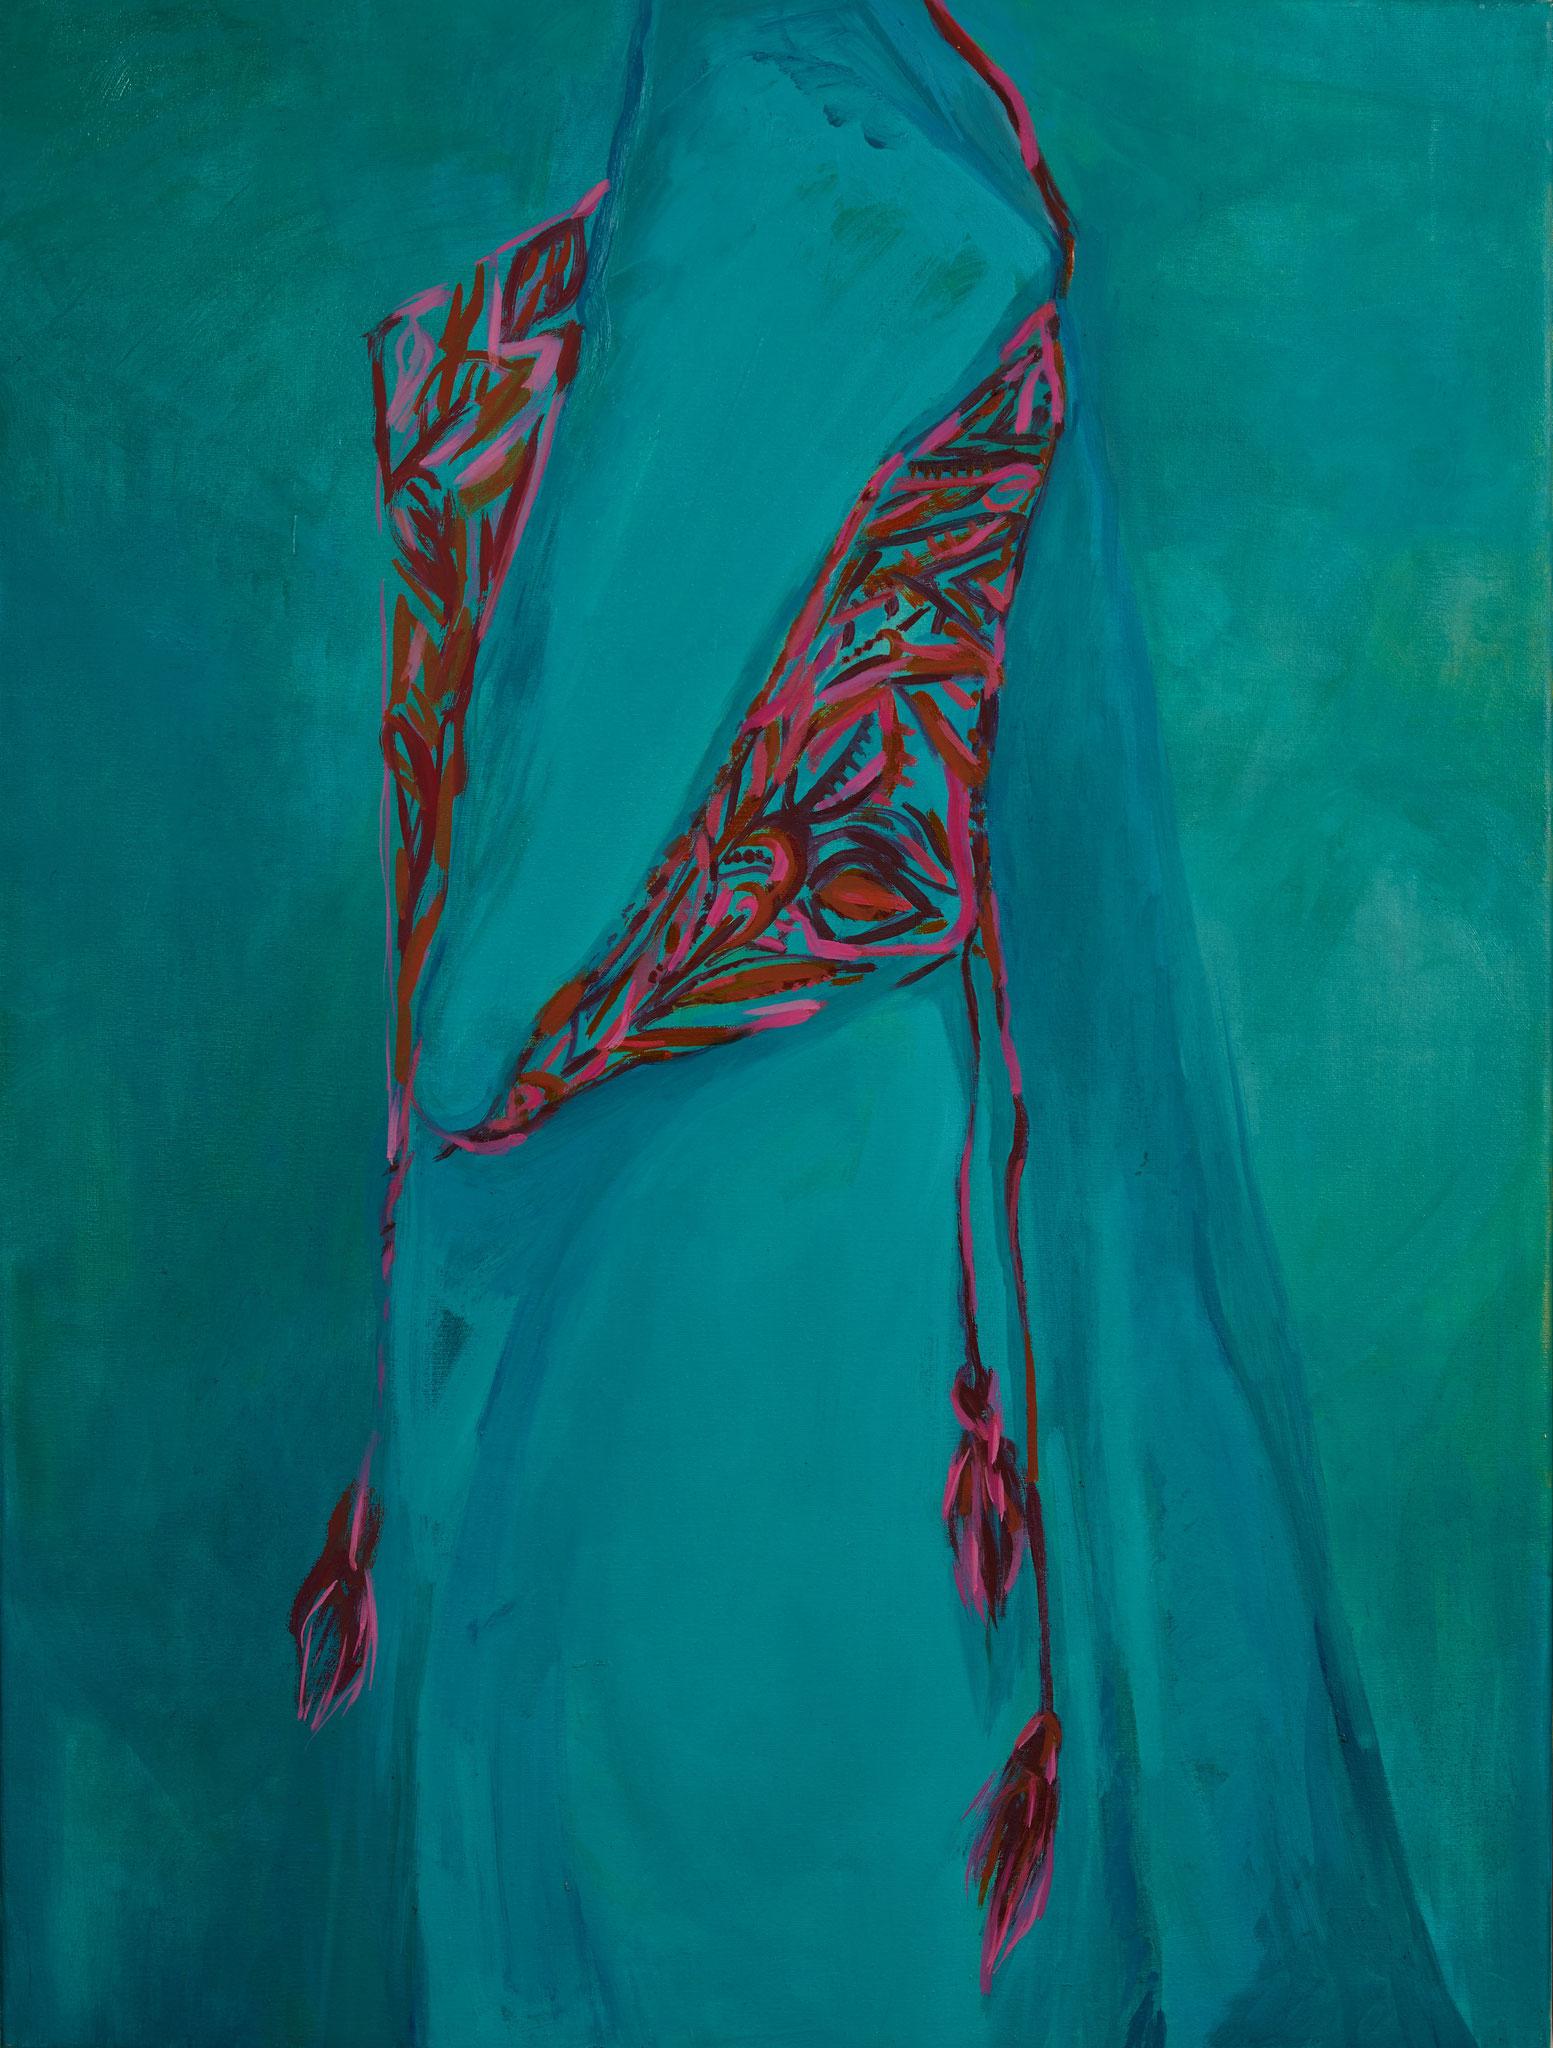 Ma Blouse roumaine, Huile sur toile, 2015, 60 x 80 cm